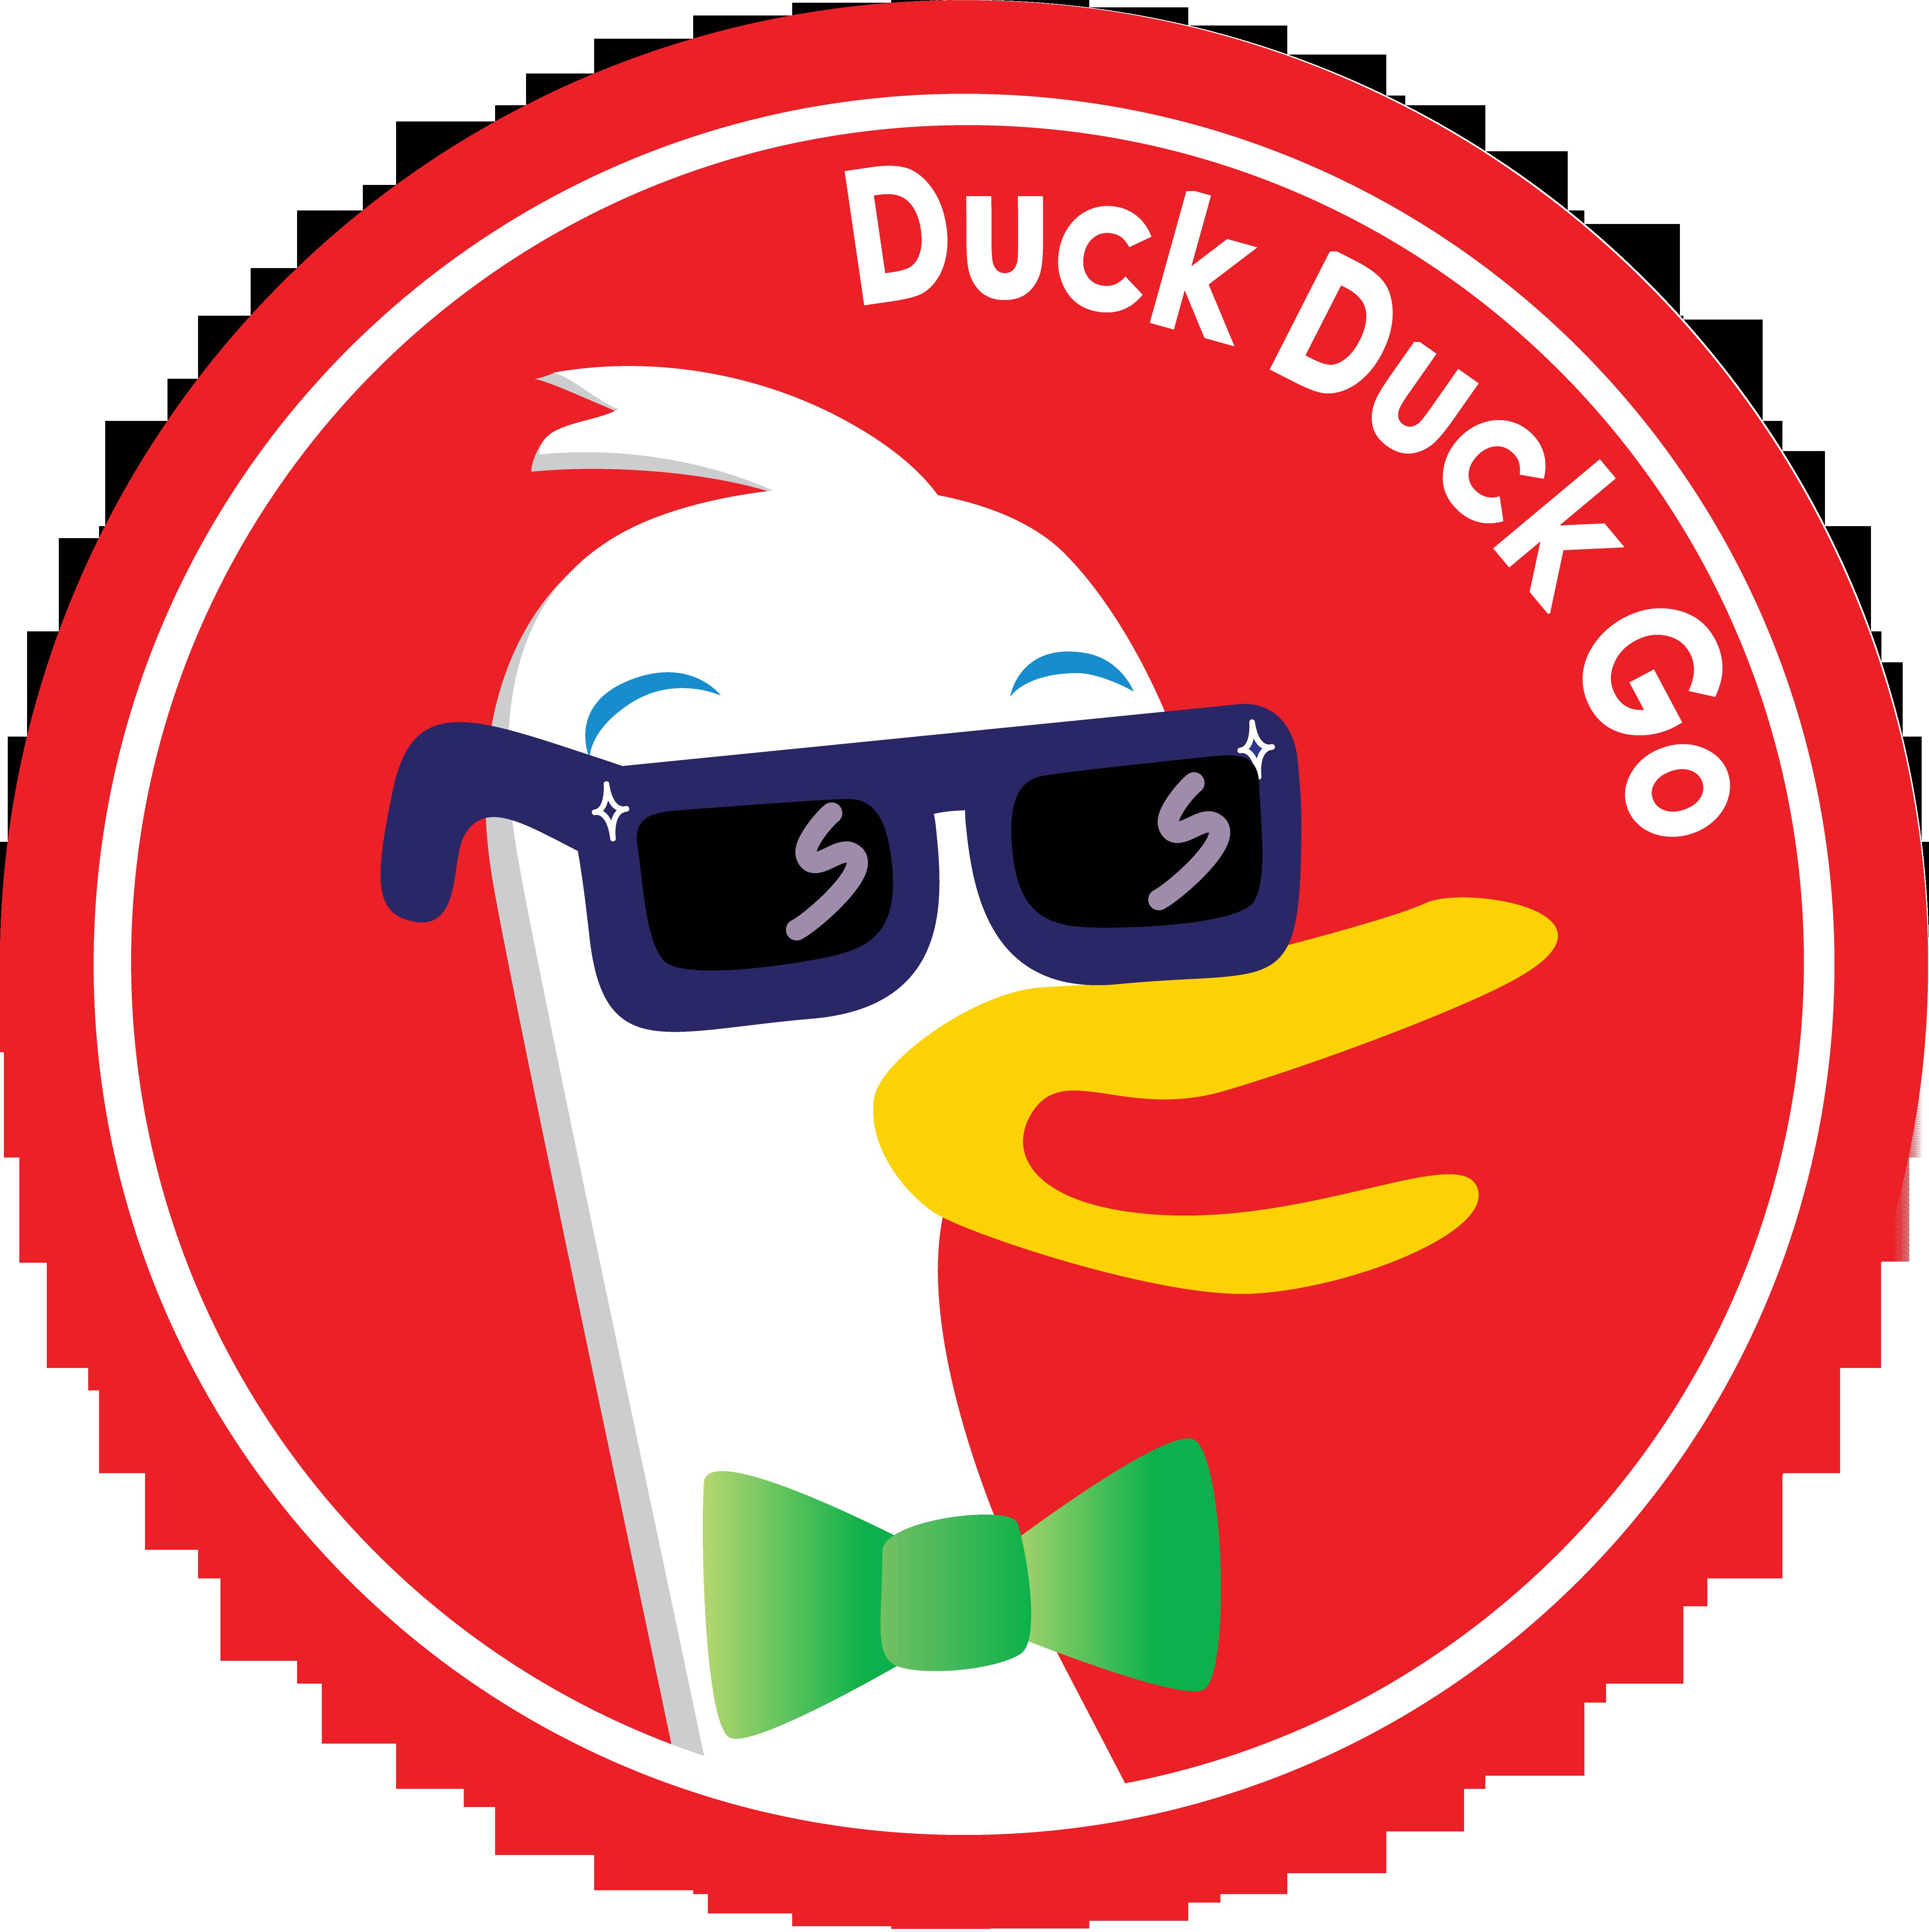 In the wake of the NSA s Duckduckgo